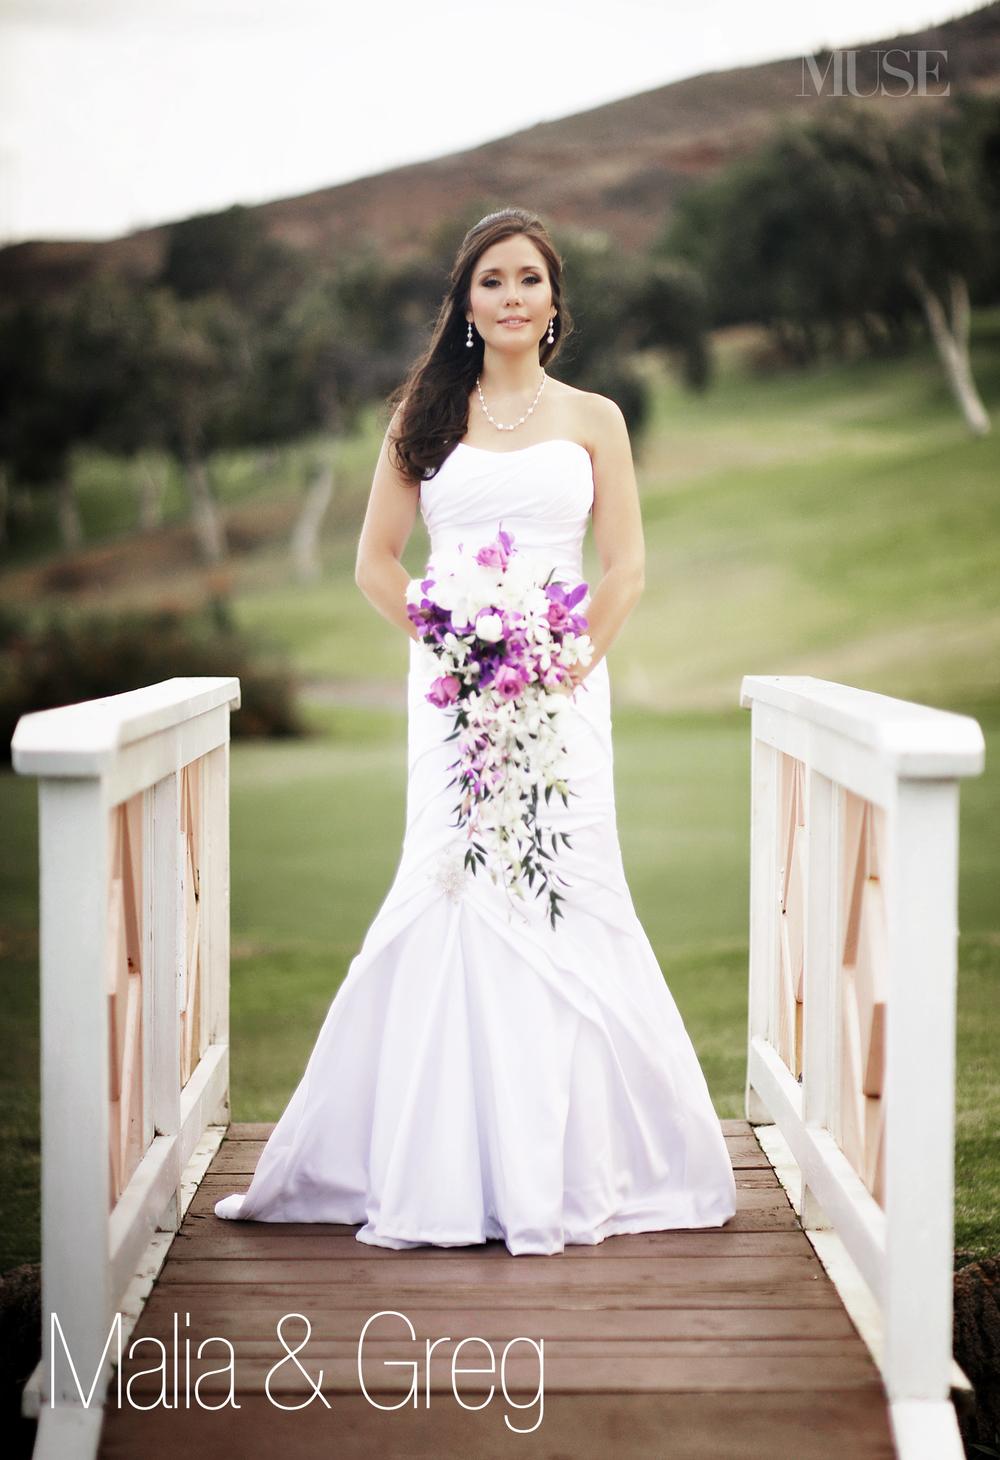 MUSE Bride - Maui Wedding